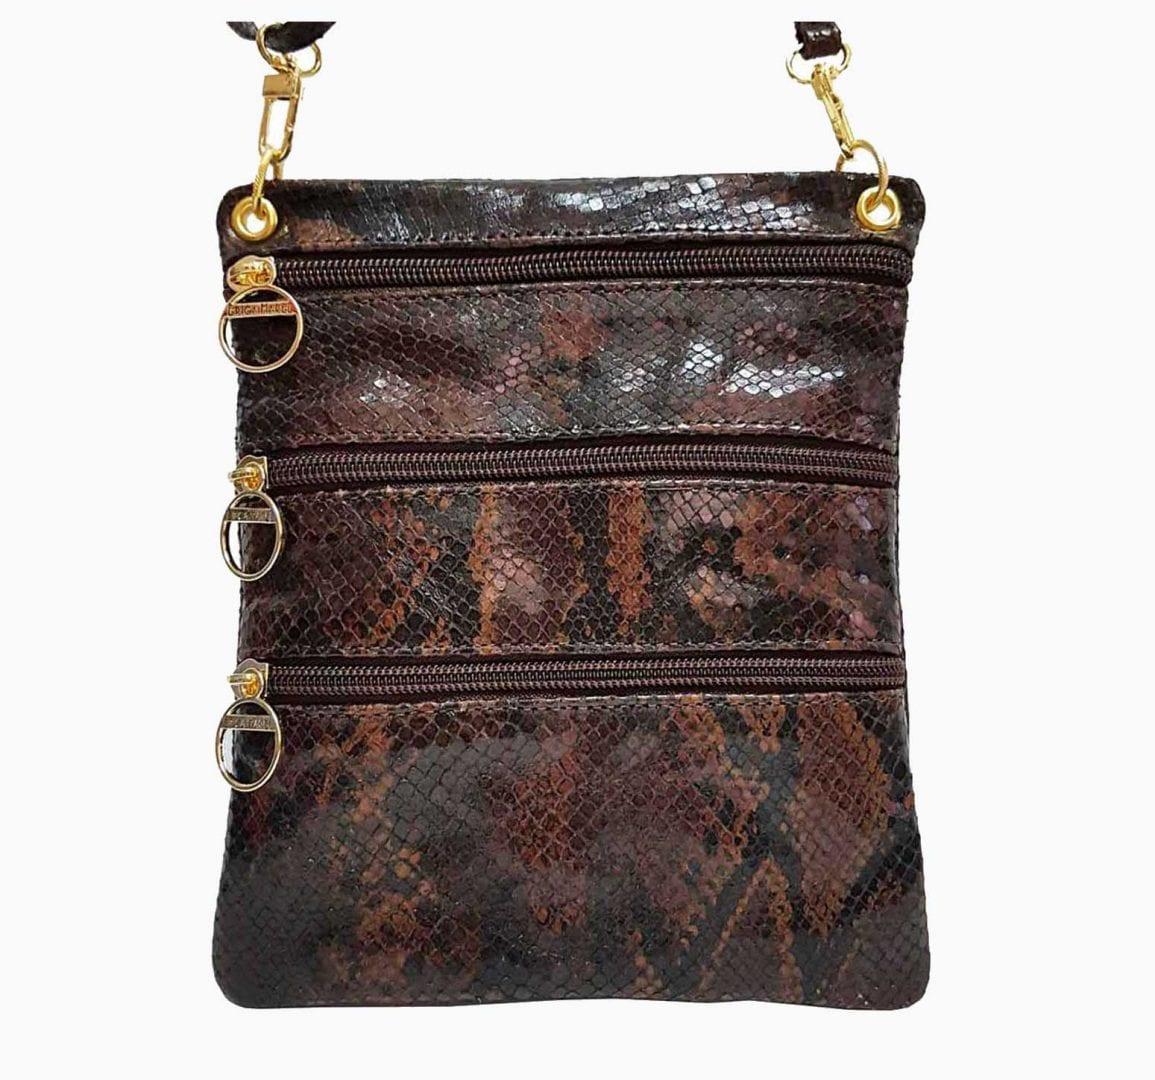 snakeskin leather sidekick mini bag